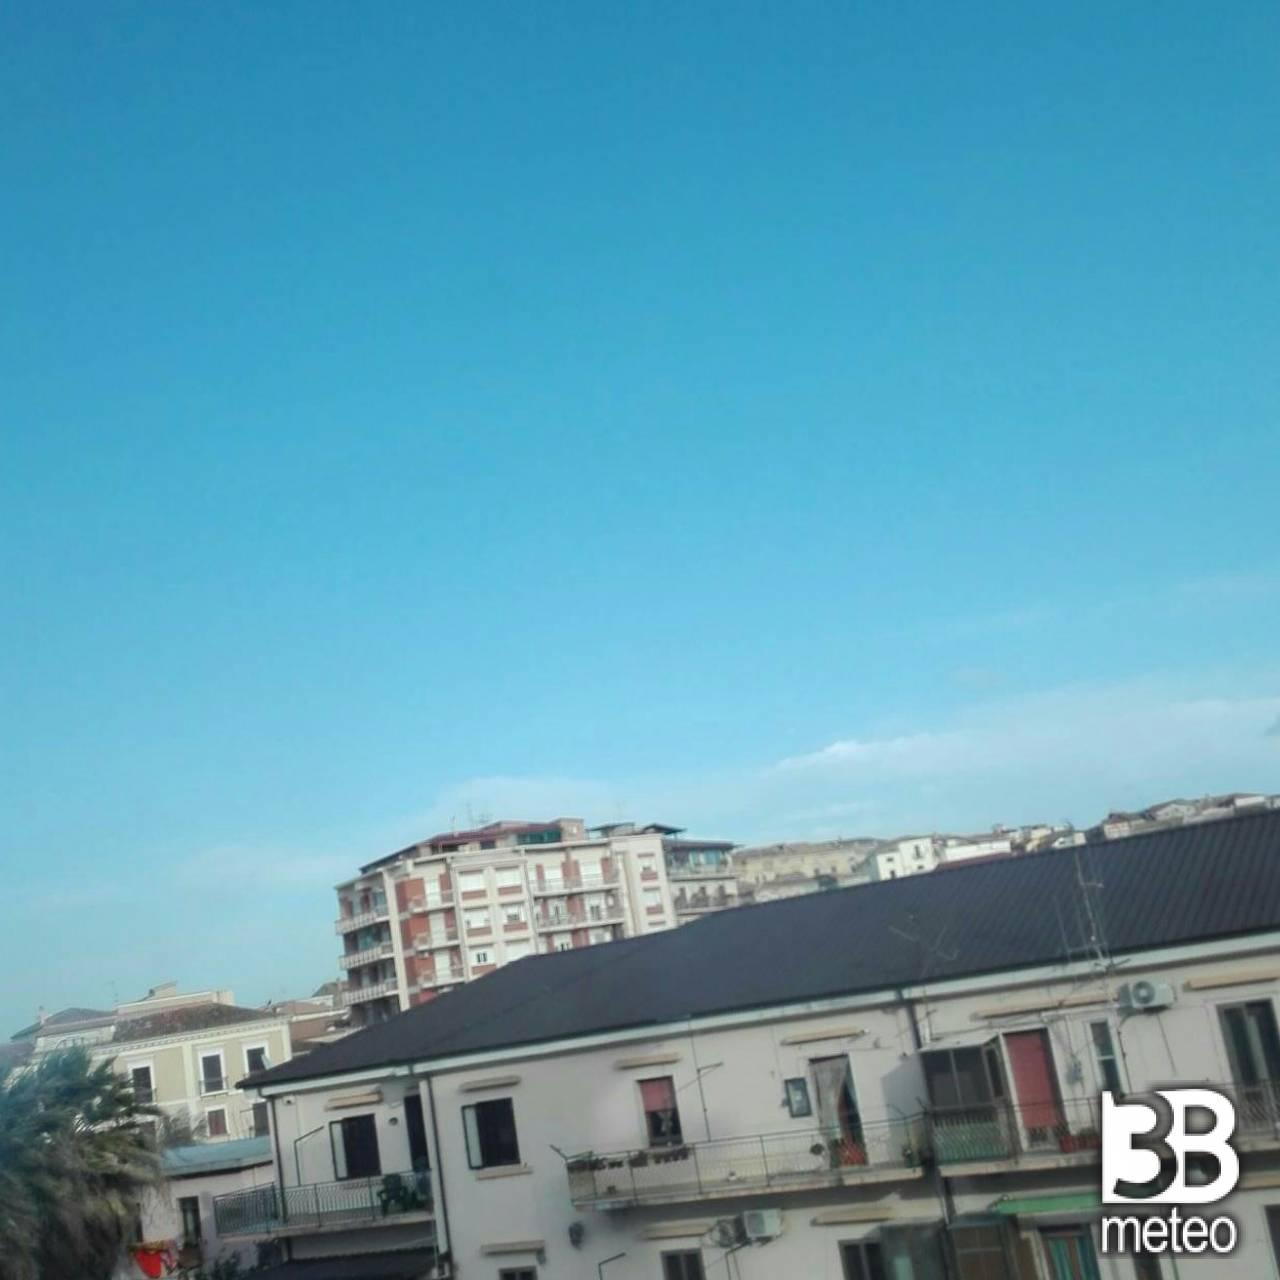 Foto Meteo: Crotone « 3B Meteo